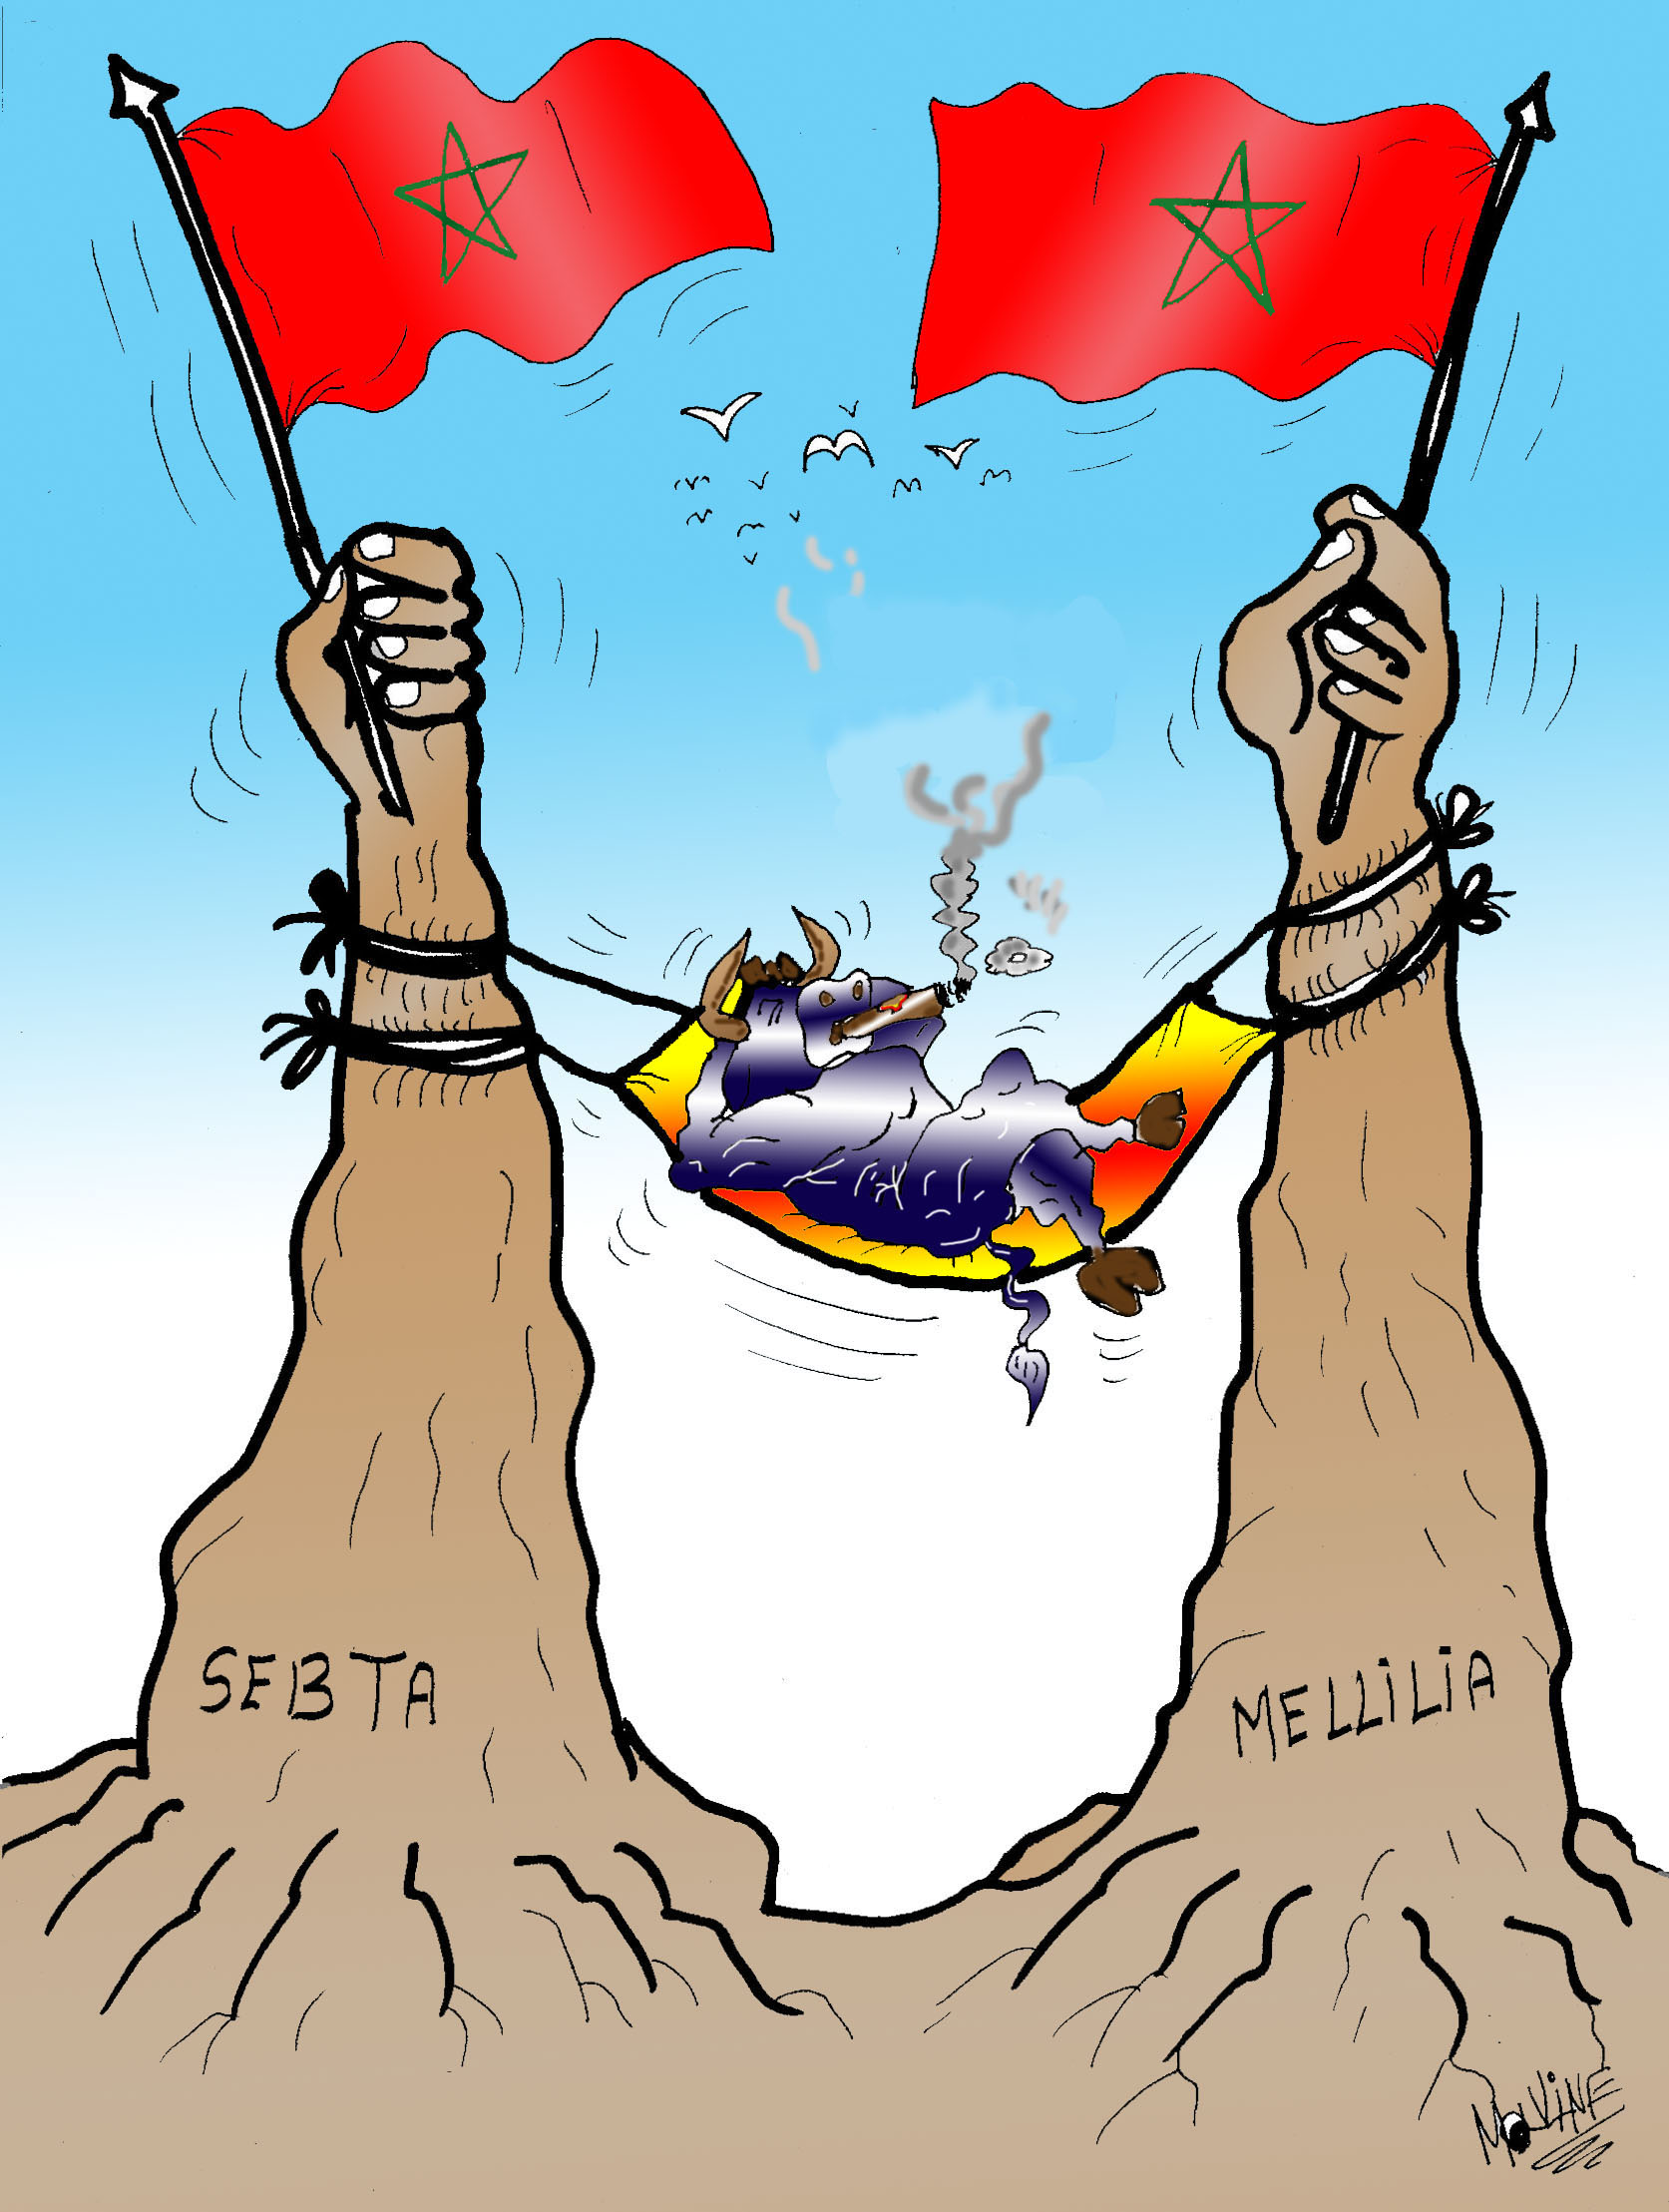 Hola Madrid : Sebta y Melililia son marroquíes